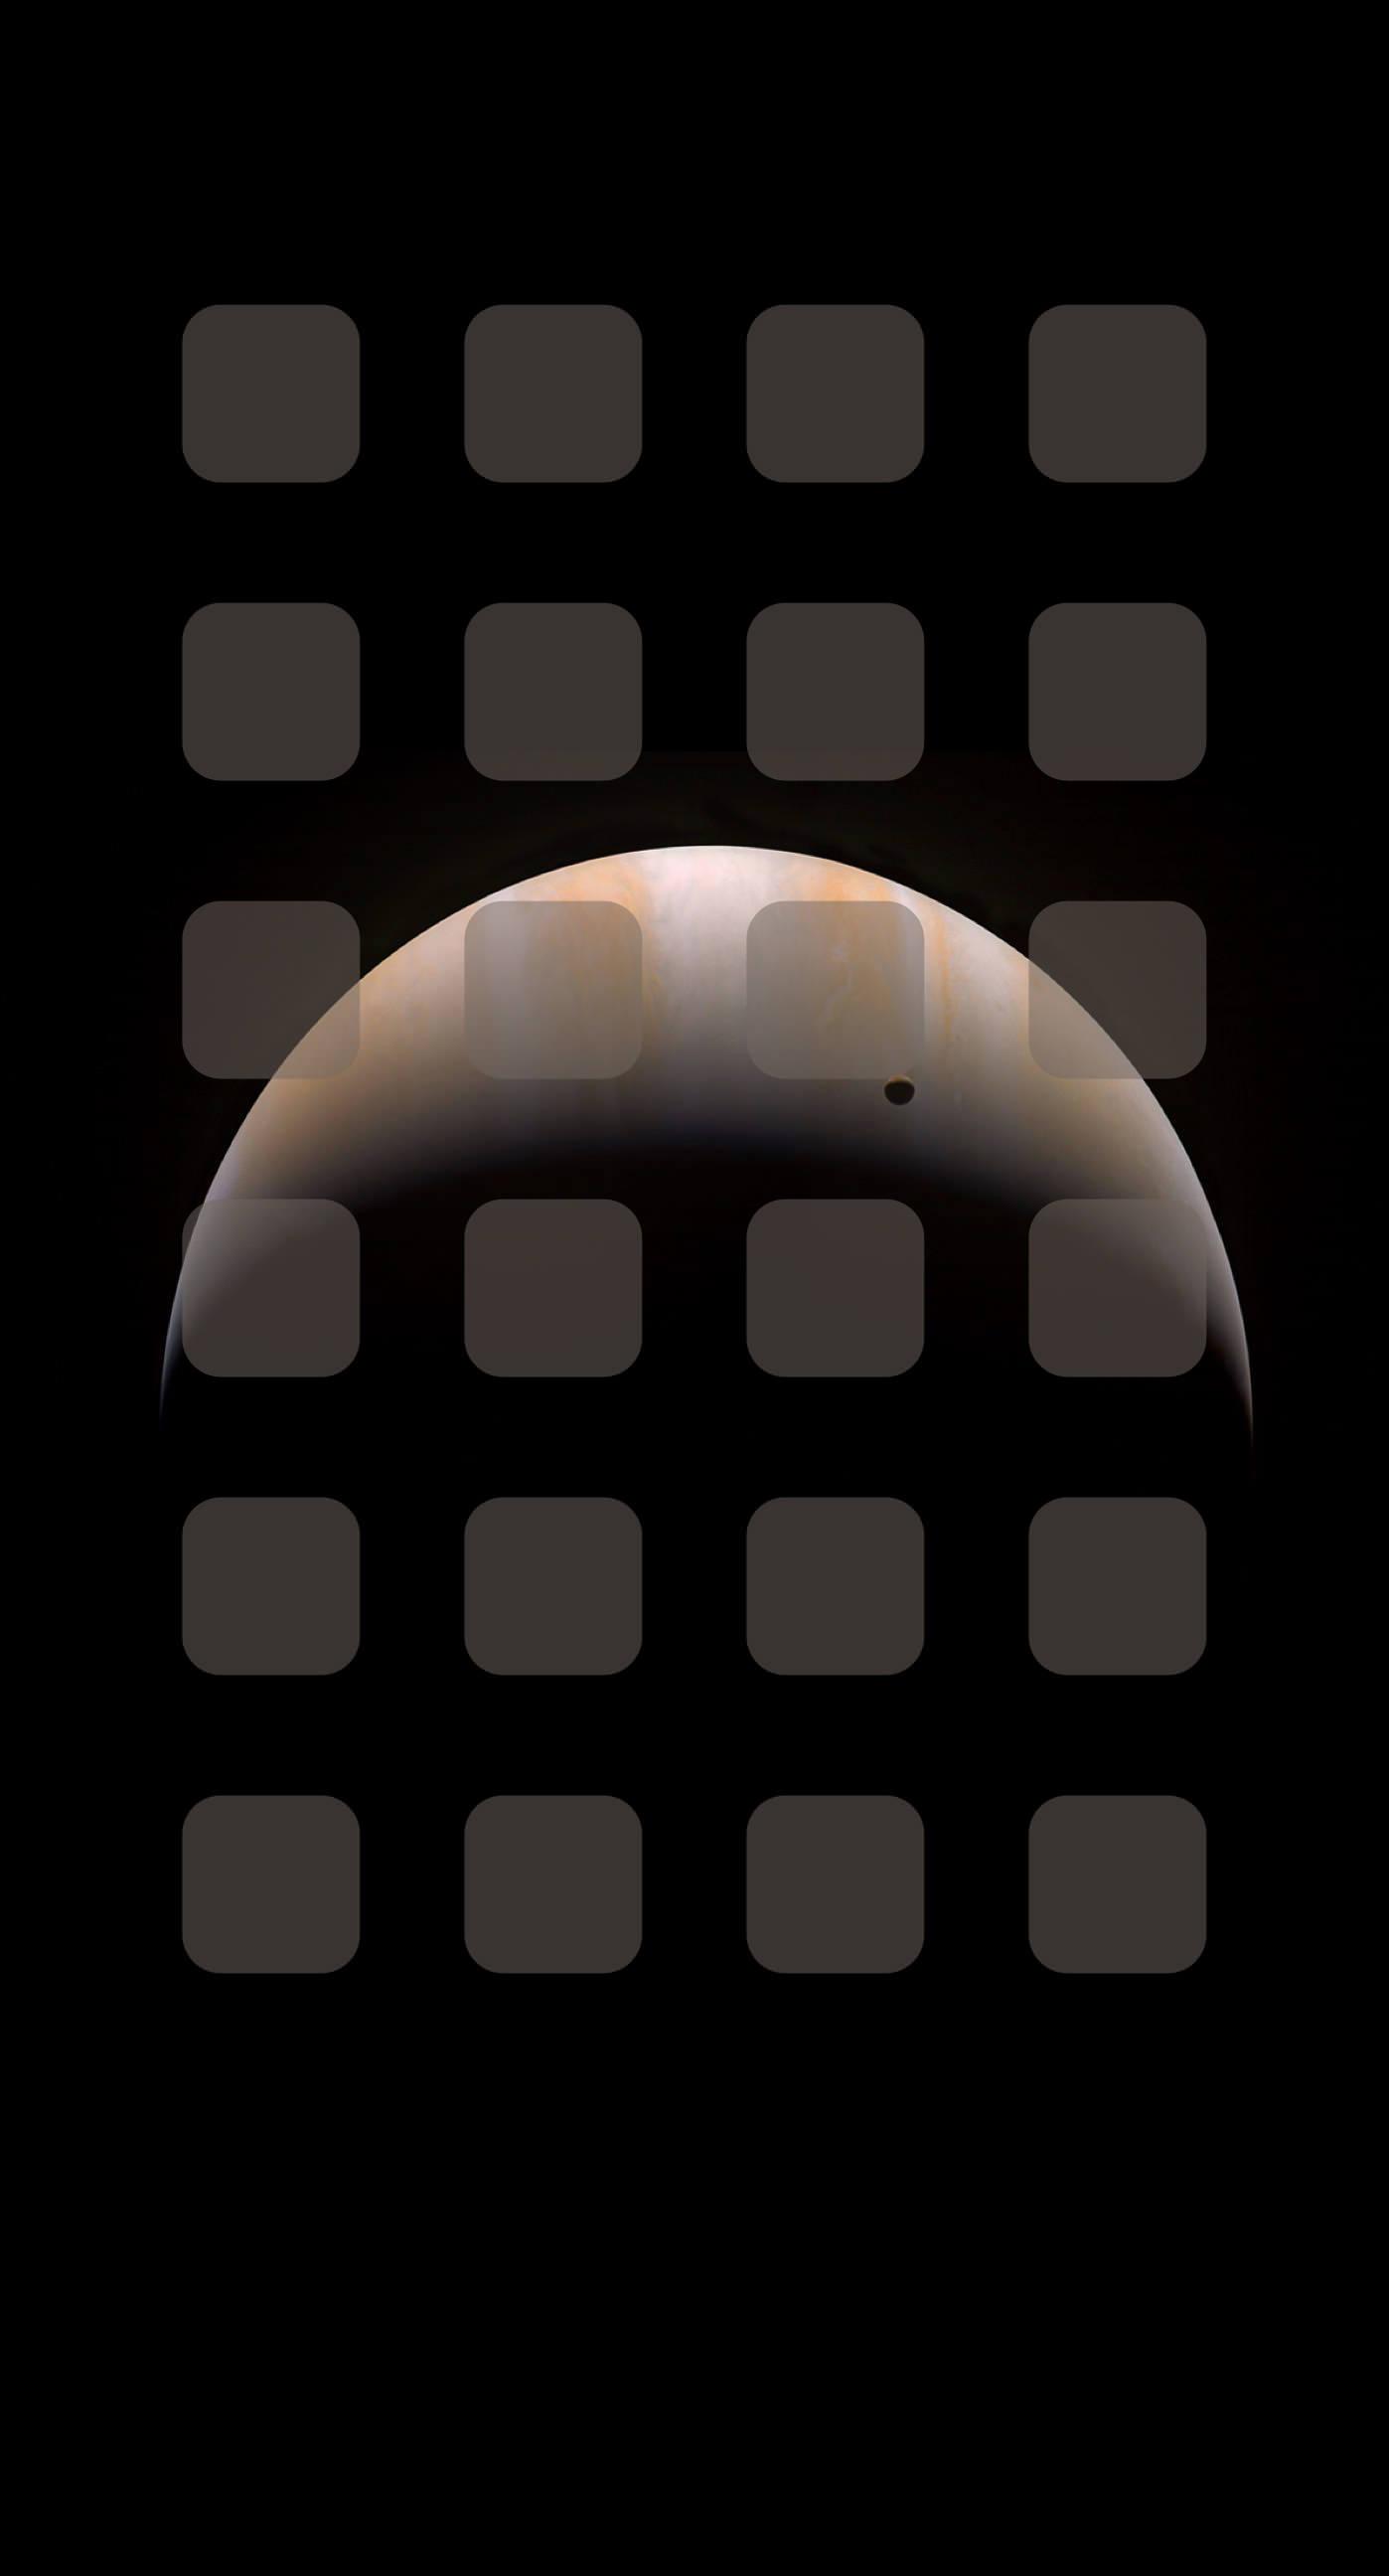 Space planet brown shelf wallpapersc iPhone7Plus 1398x2592